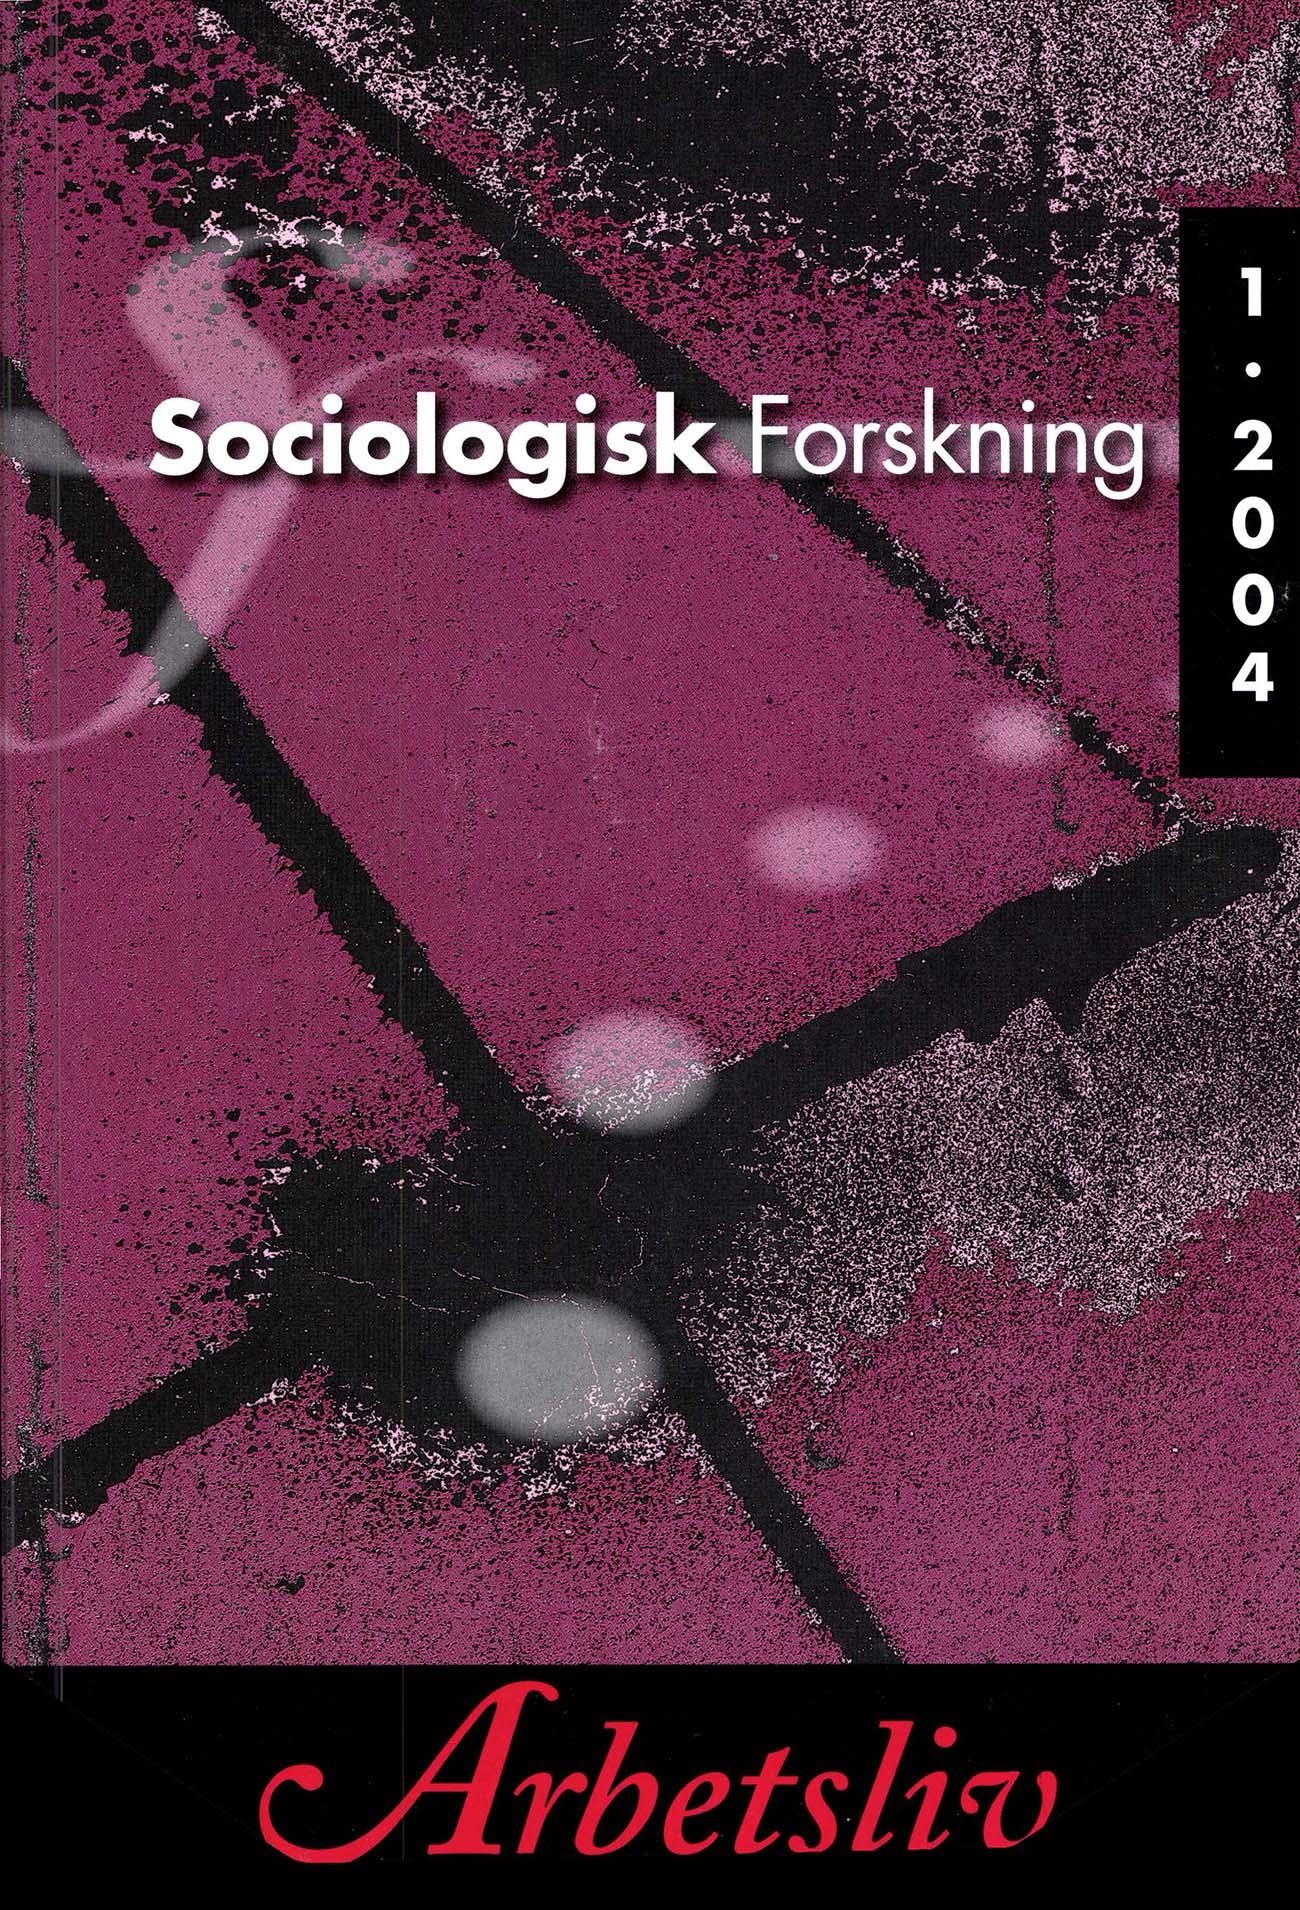 Visa Vol 41 Nr 1 (2004): Tema: Arbetsliv